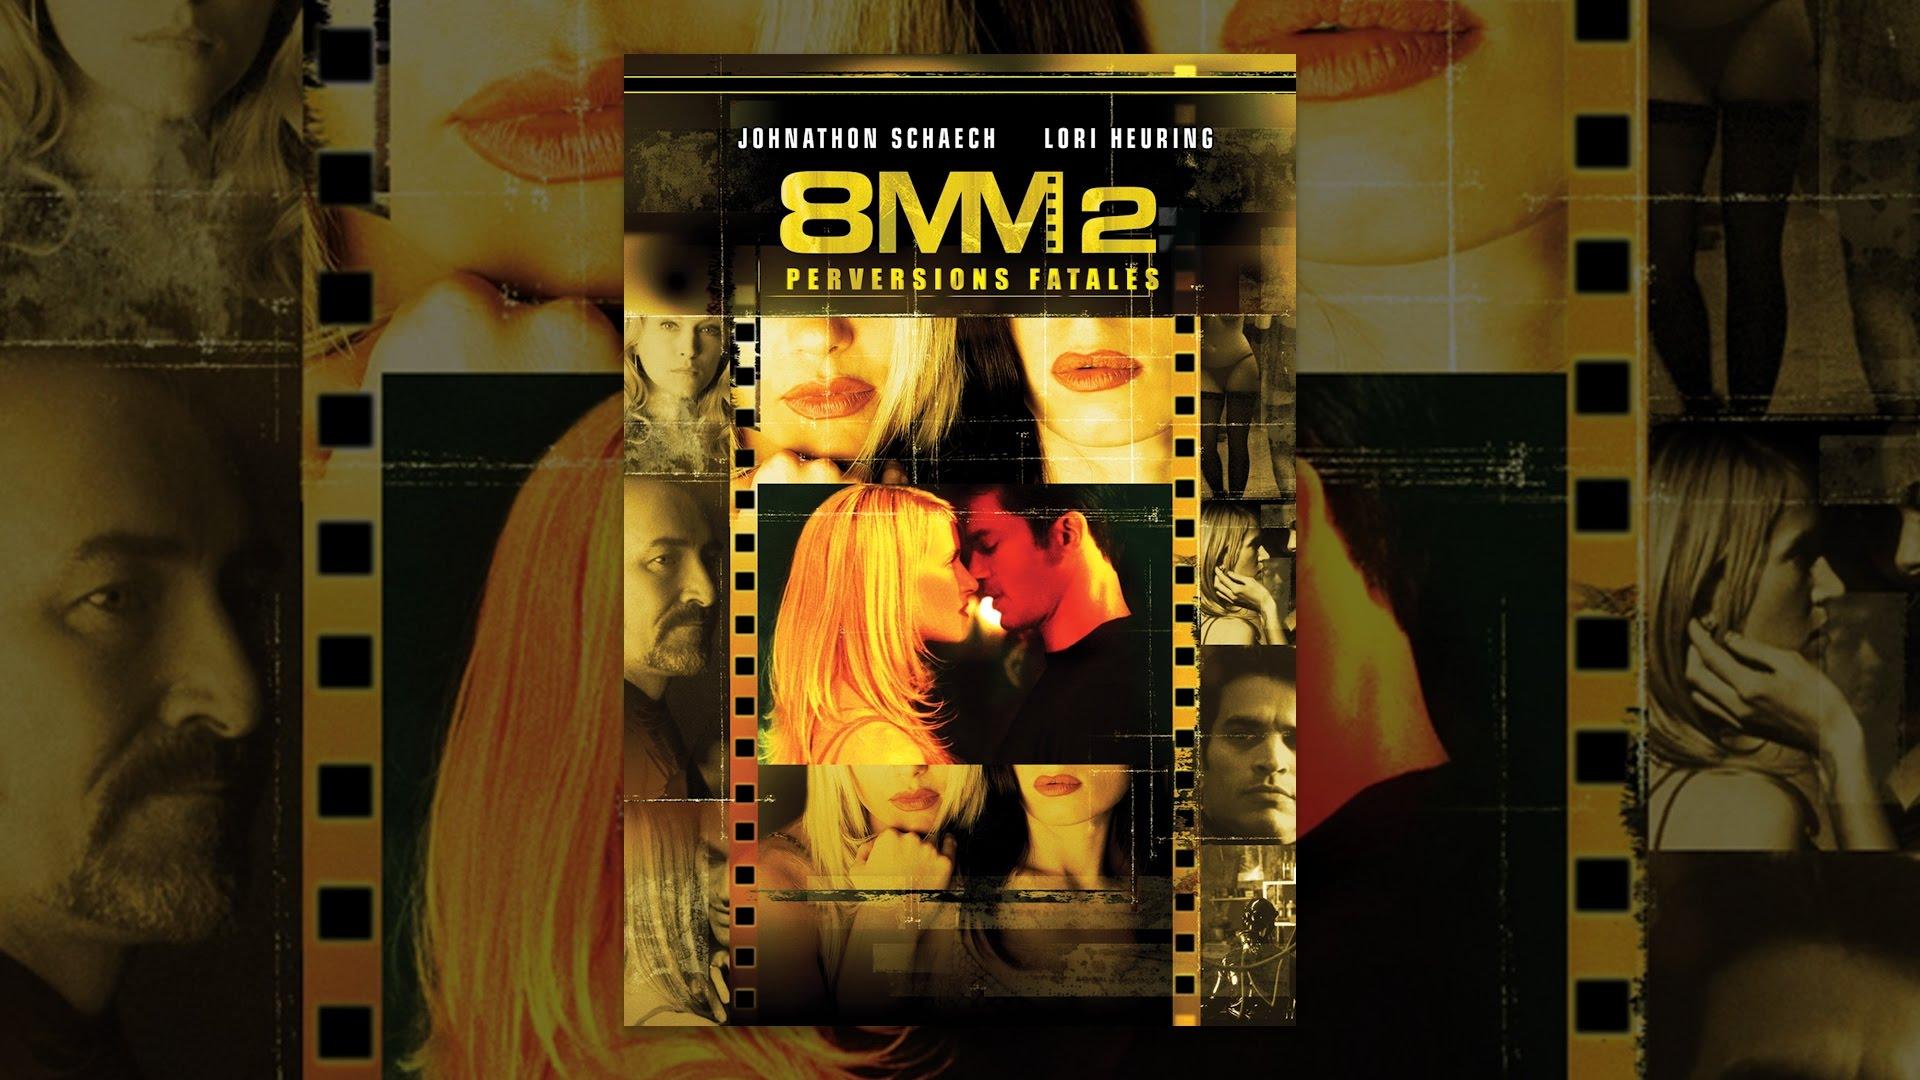 Download 8 Mm 2 (VF)